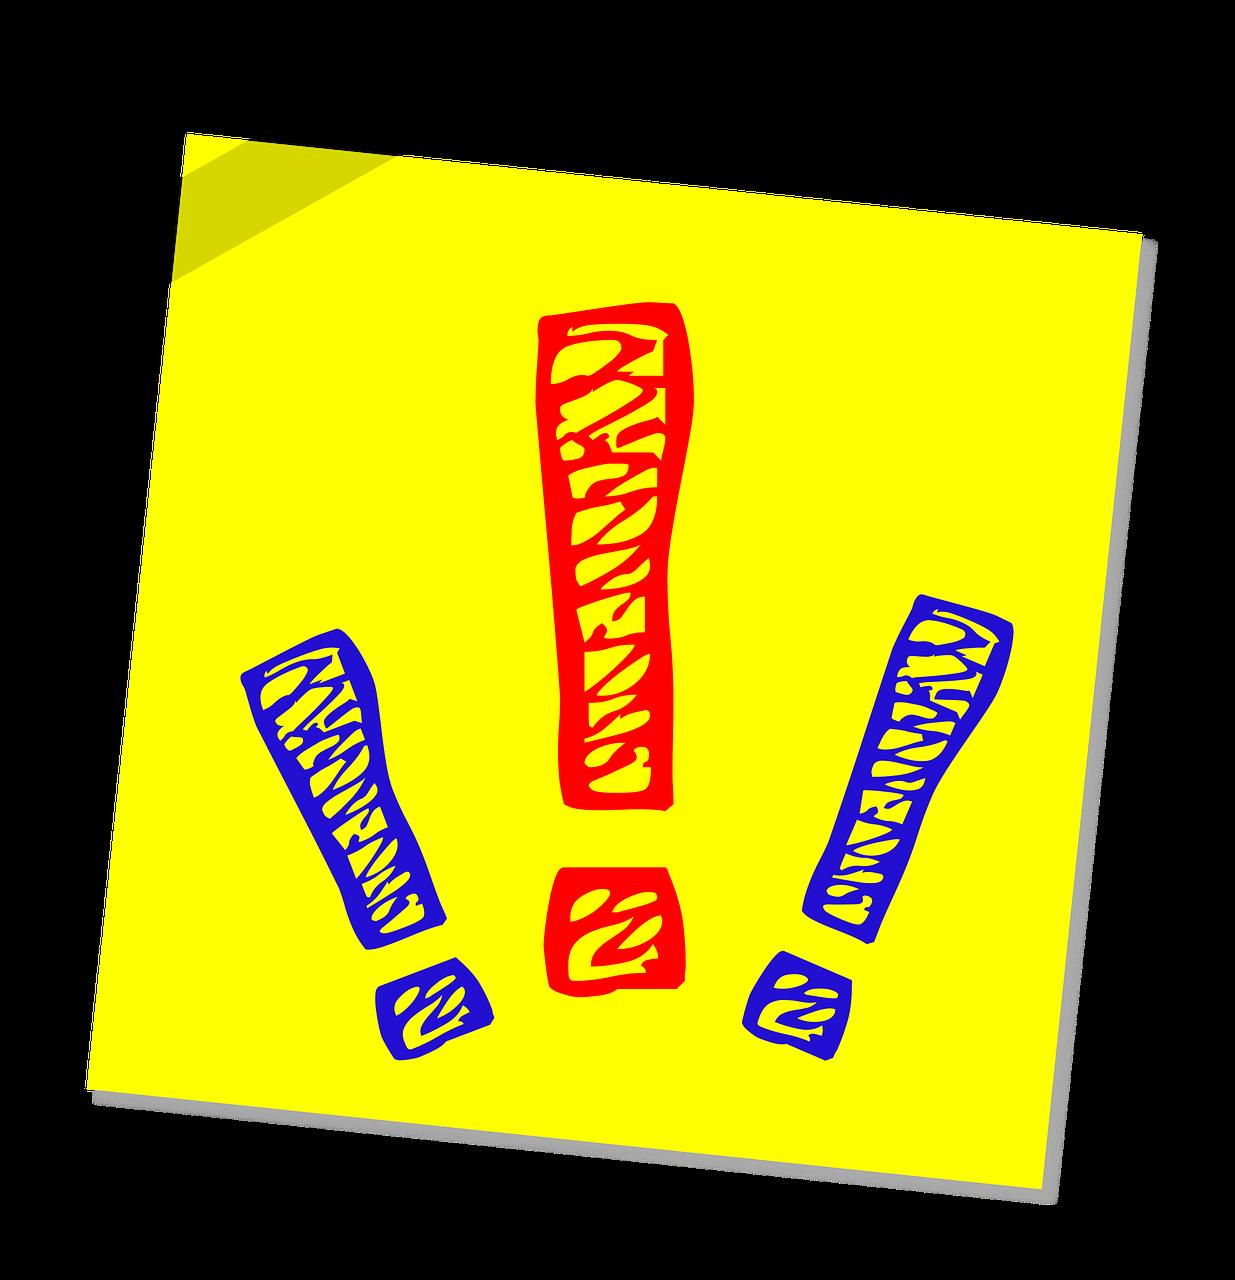 Verhandlung Agieren Re-agieren Verhandlungsirrtümer Irrtum Machtspiele Deeskalation Phasen Verhandlungsseminar Team